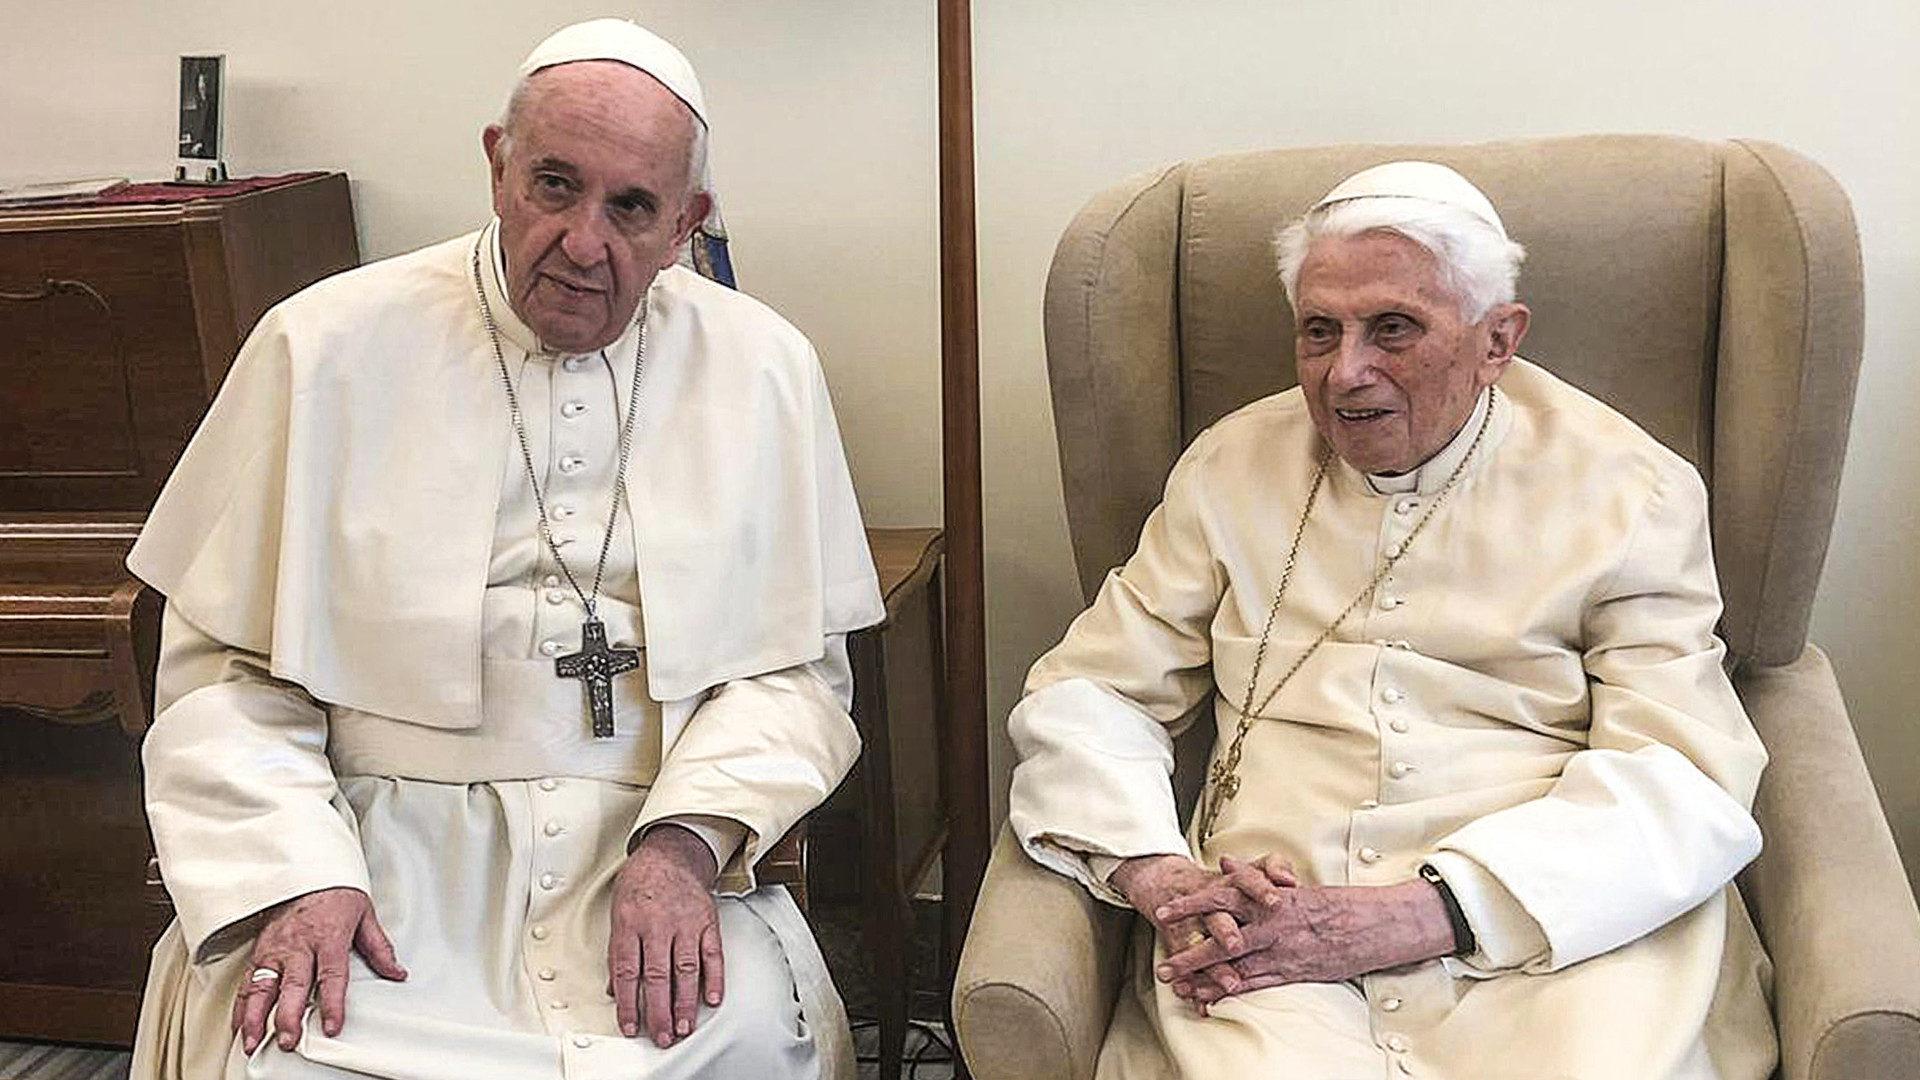 Papst Franziskus und Benedikt XVI. am 15. April 2019, Benedikts 92. Geburtstag. | © KNA